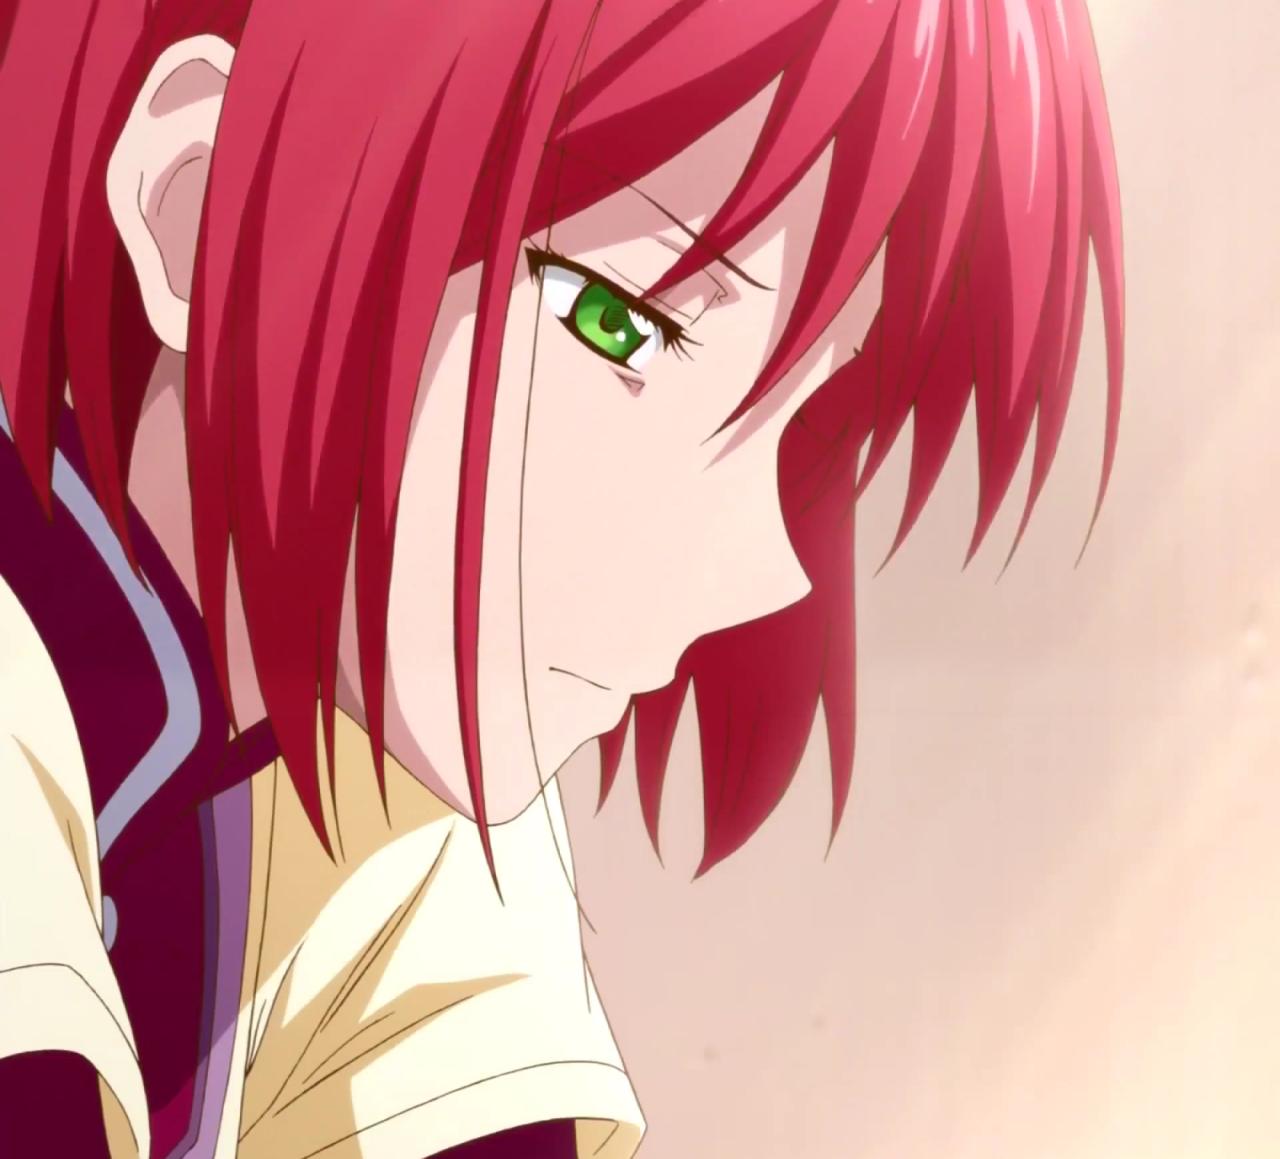 Akagami No Shirayukihime Tumblr Snow White With The Red Hair Anime Snow Akagami No